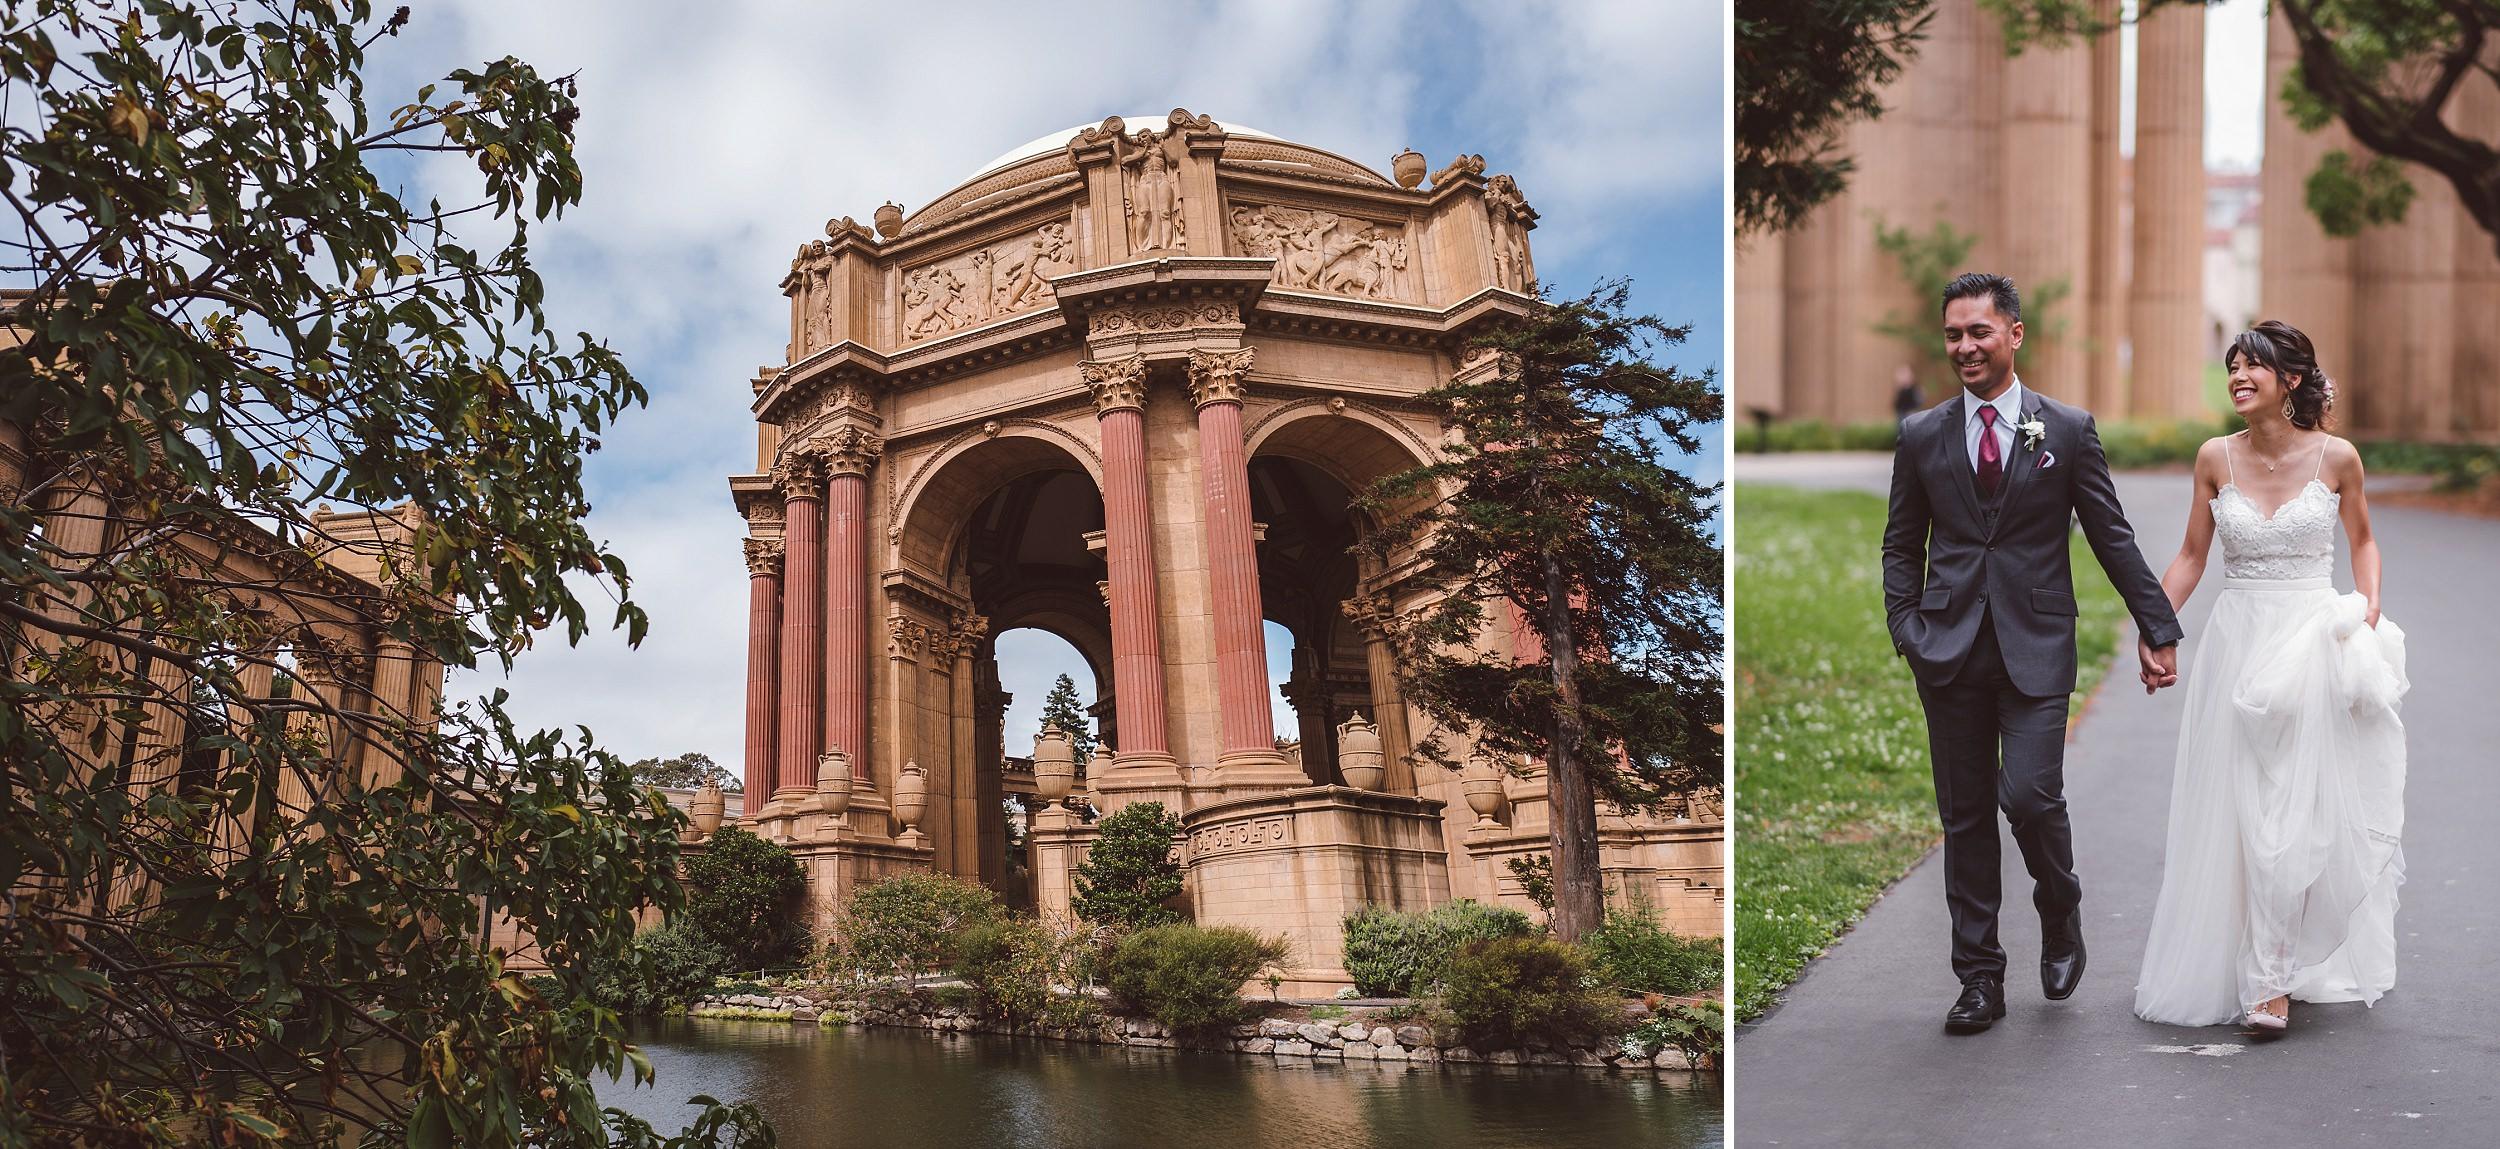 San-Francisco-City-Hall-Wedding-Photography-072.jpg